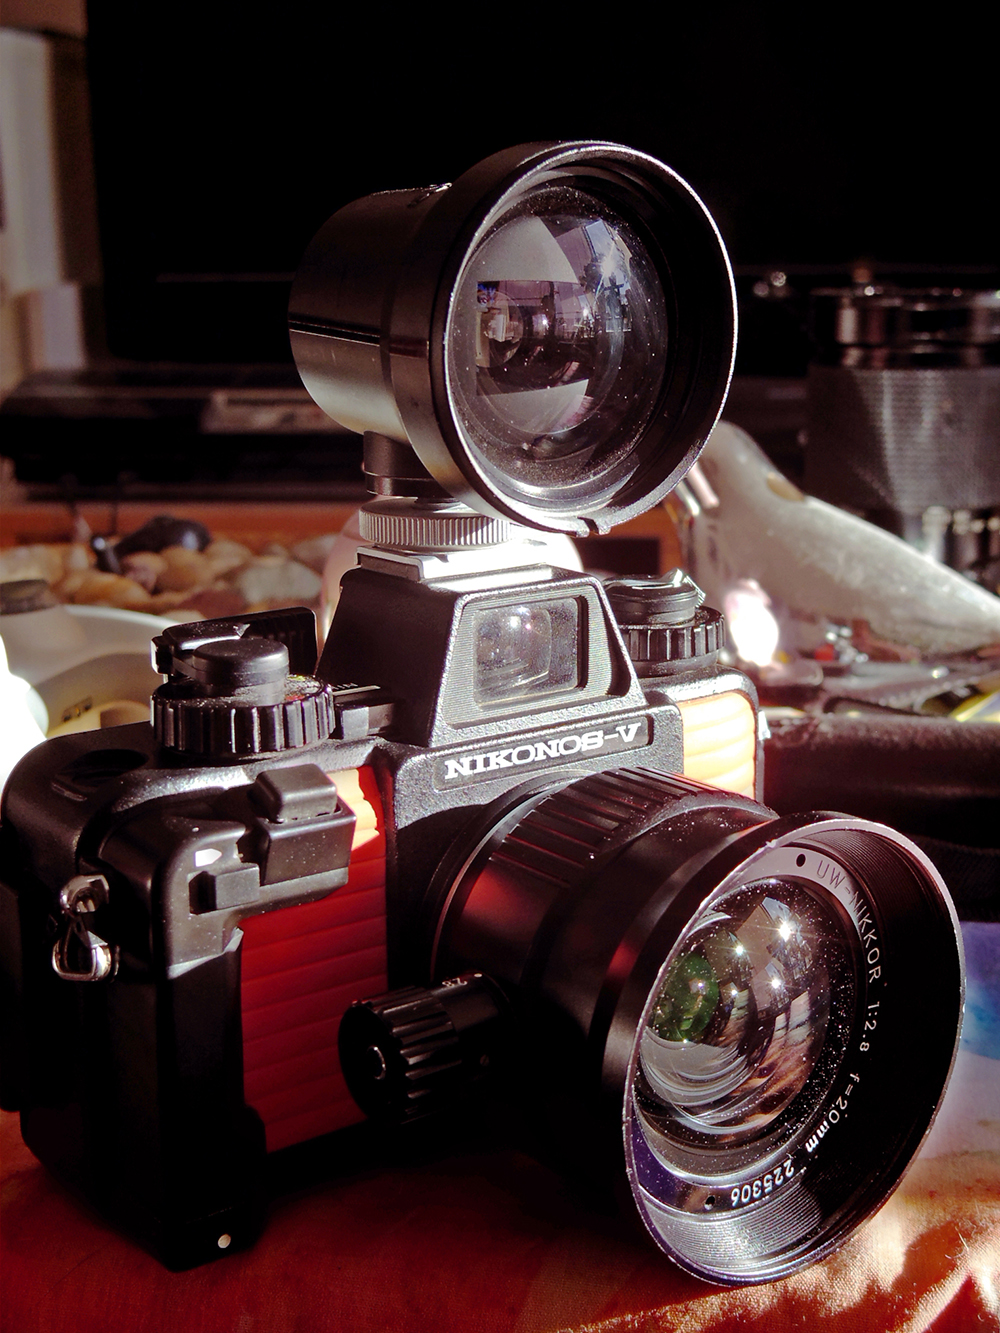 Nikonos camera